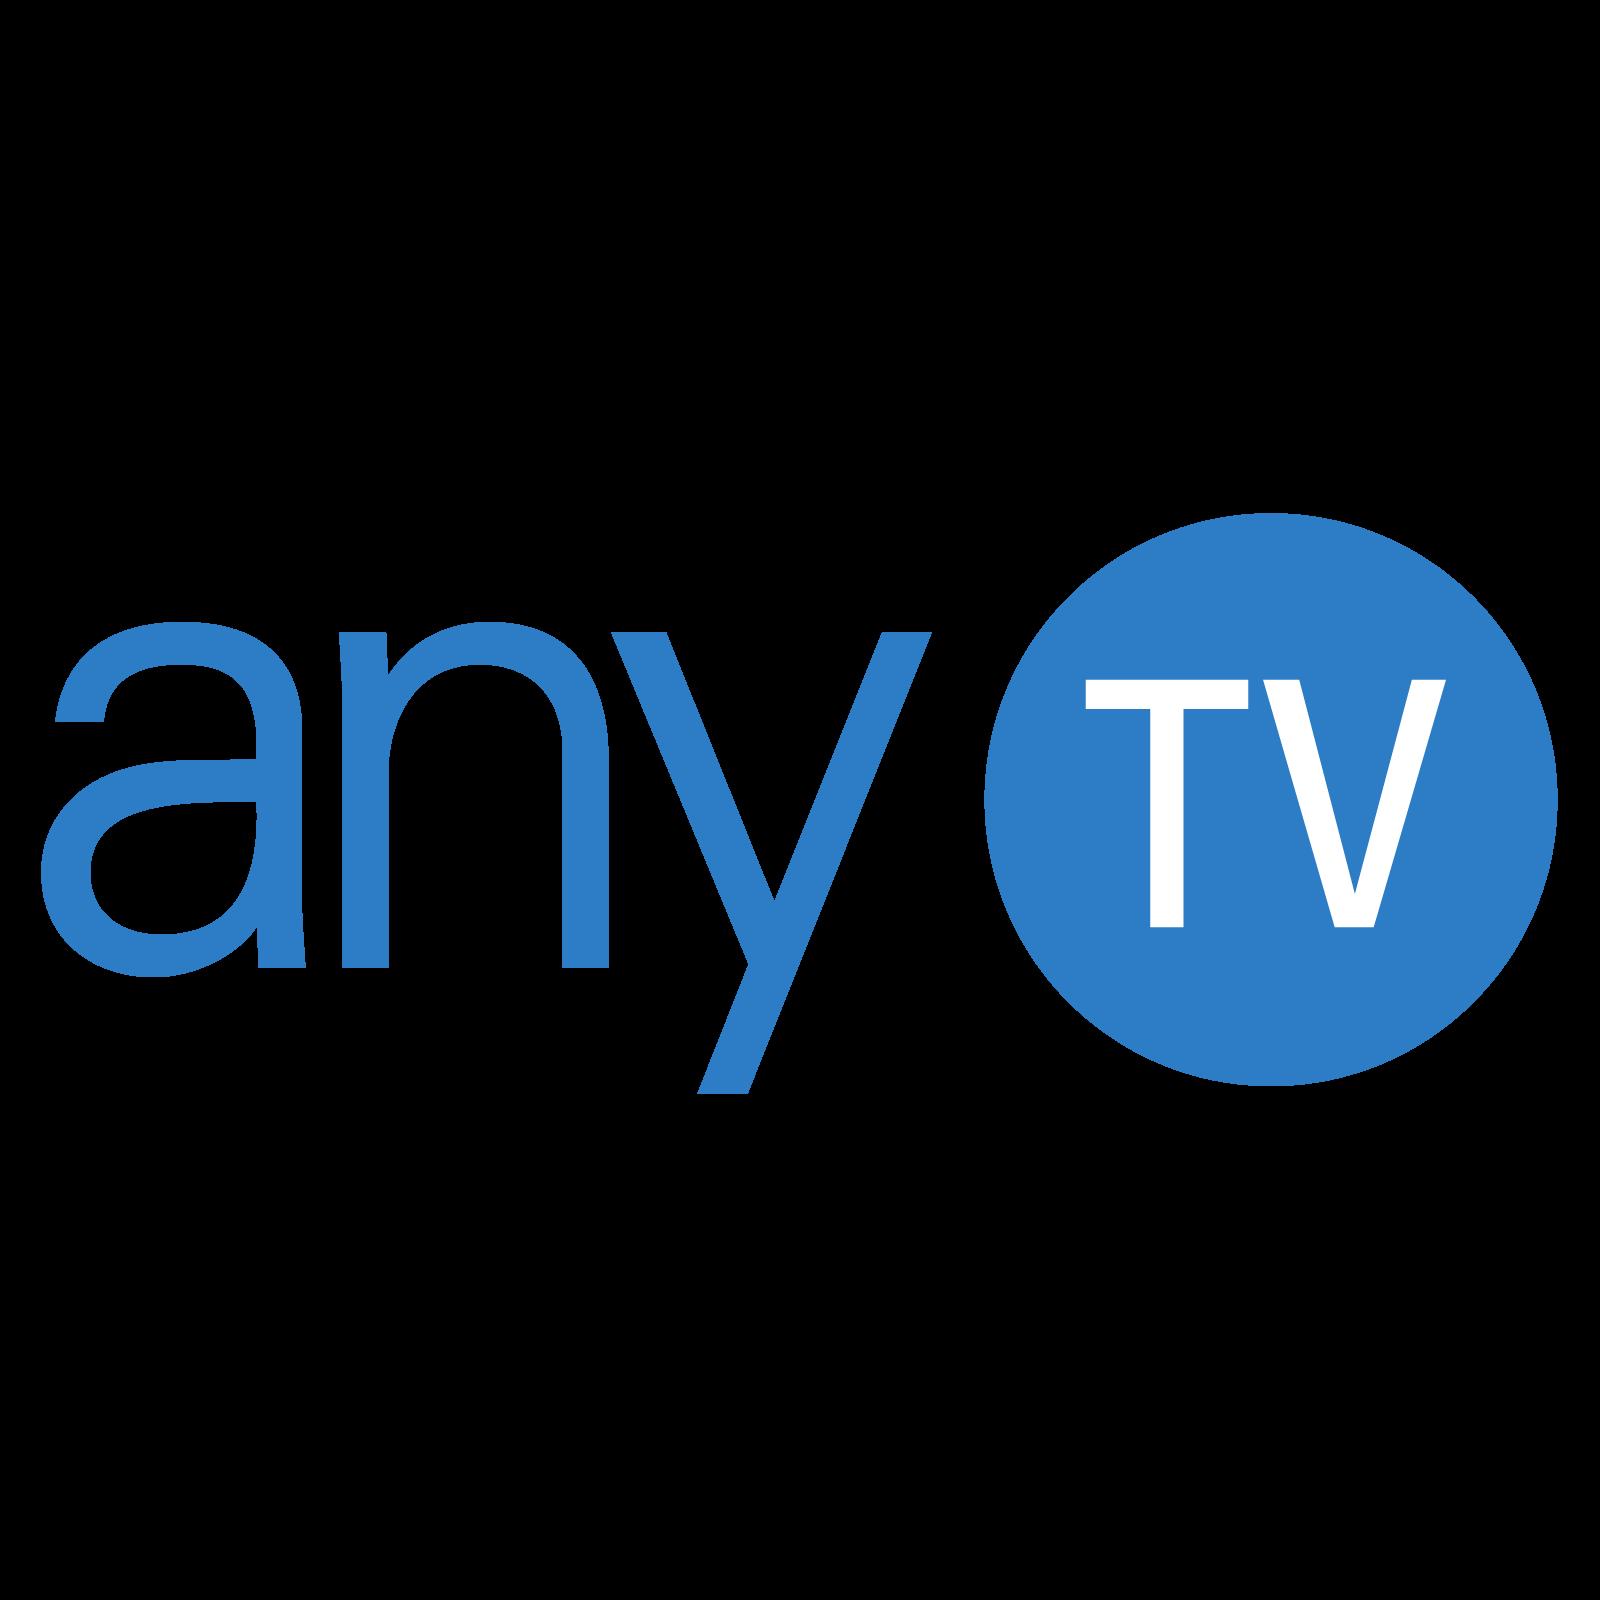 برنامج any tv